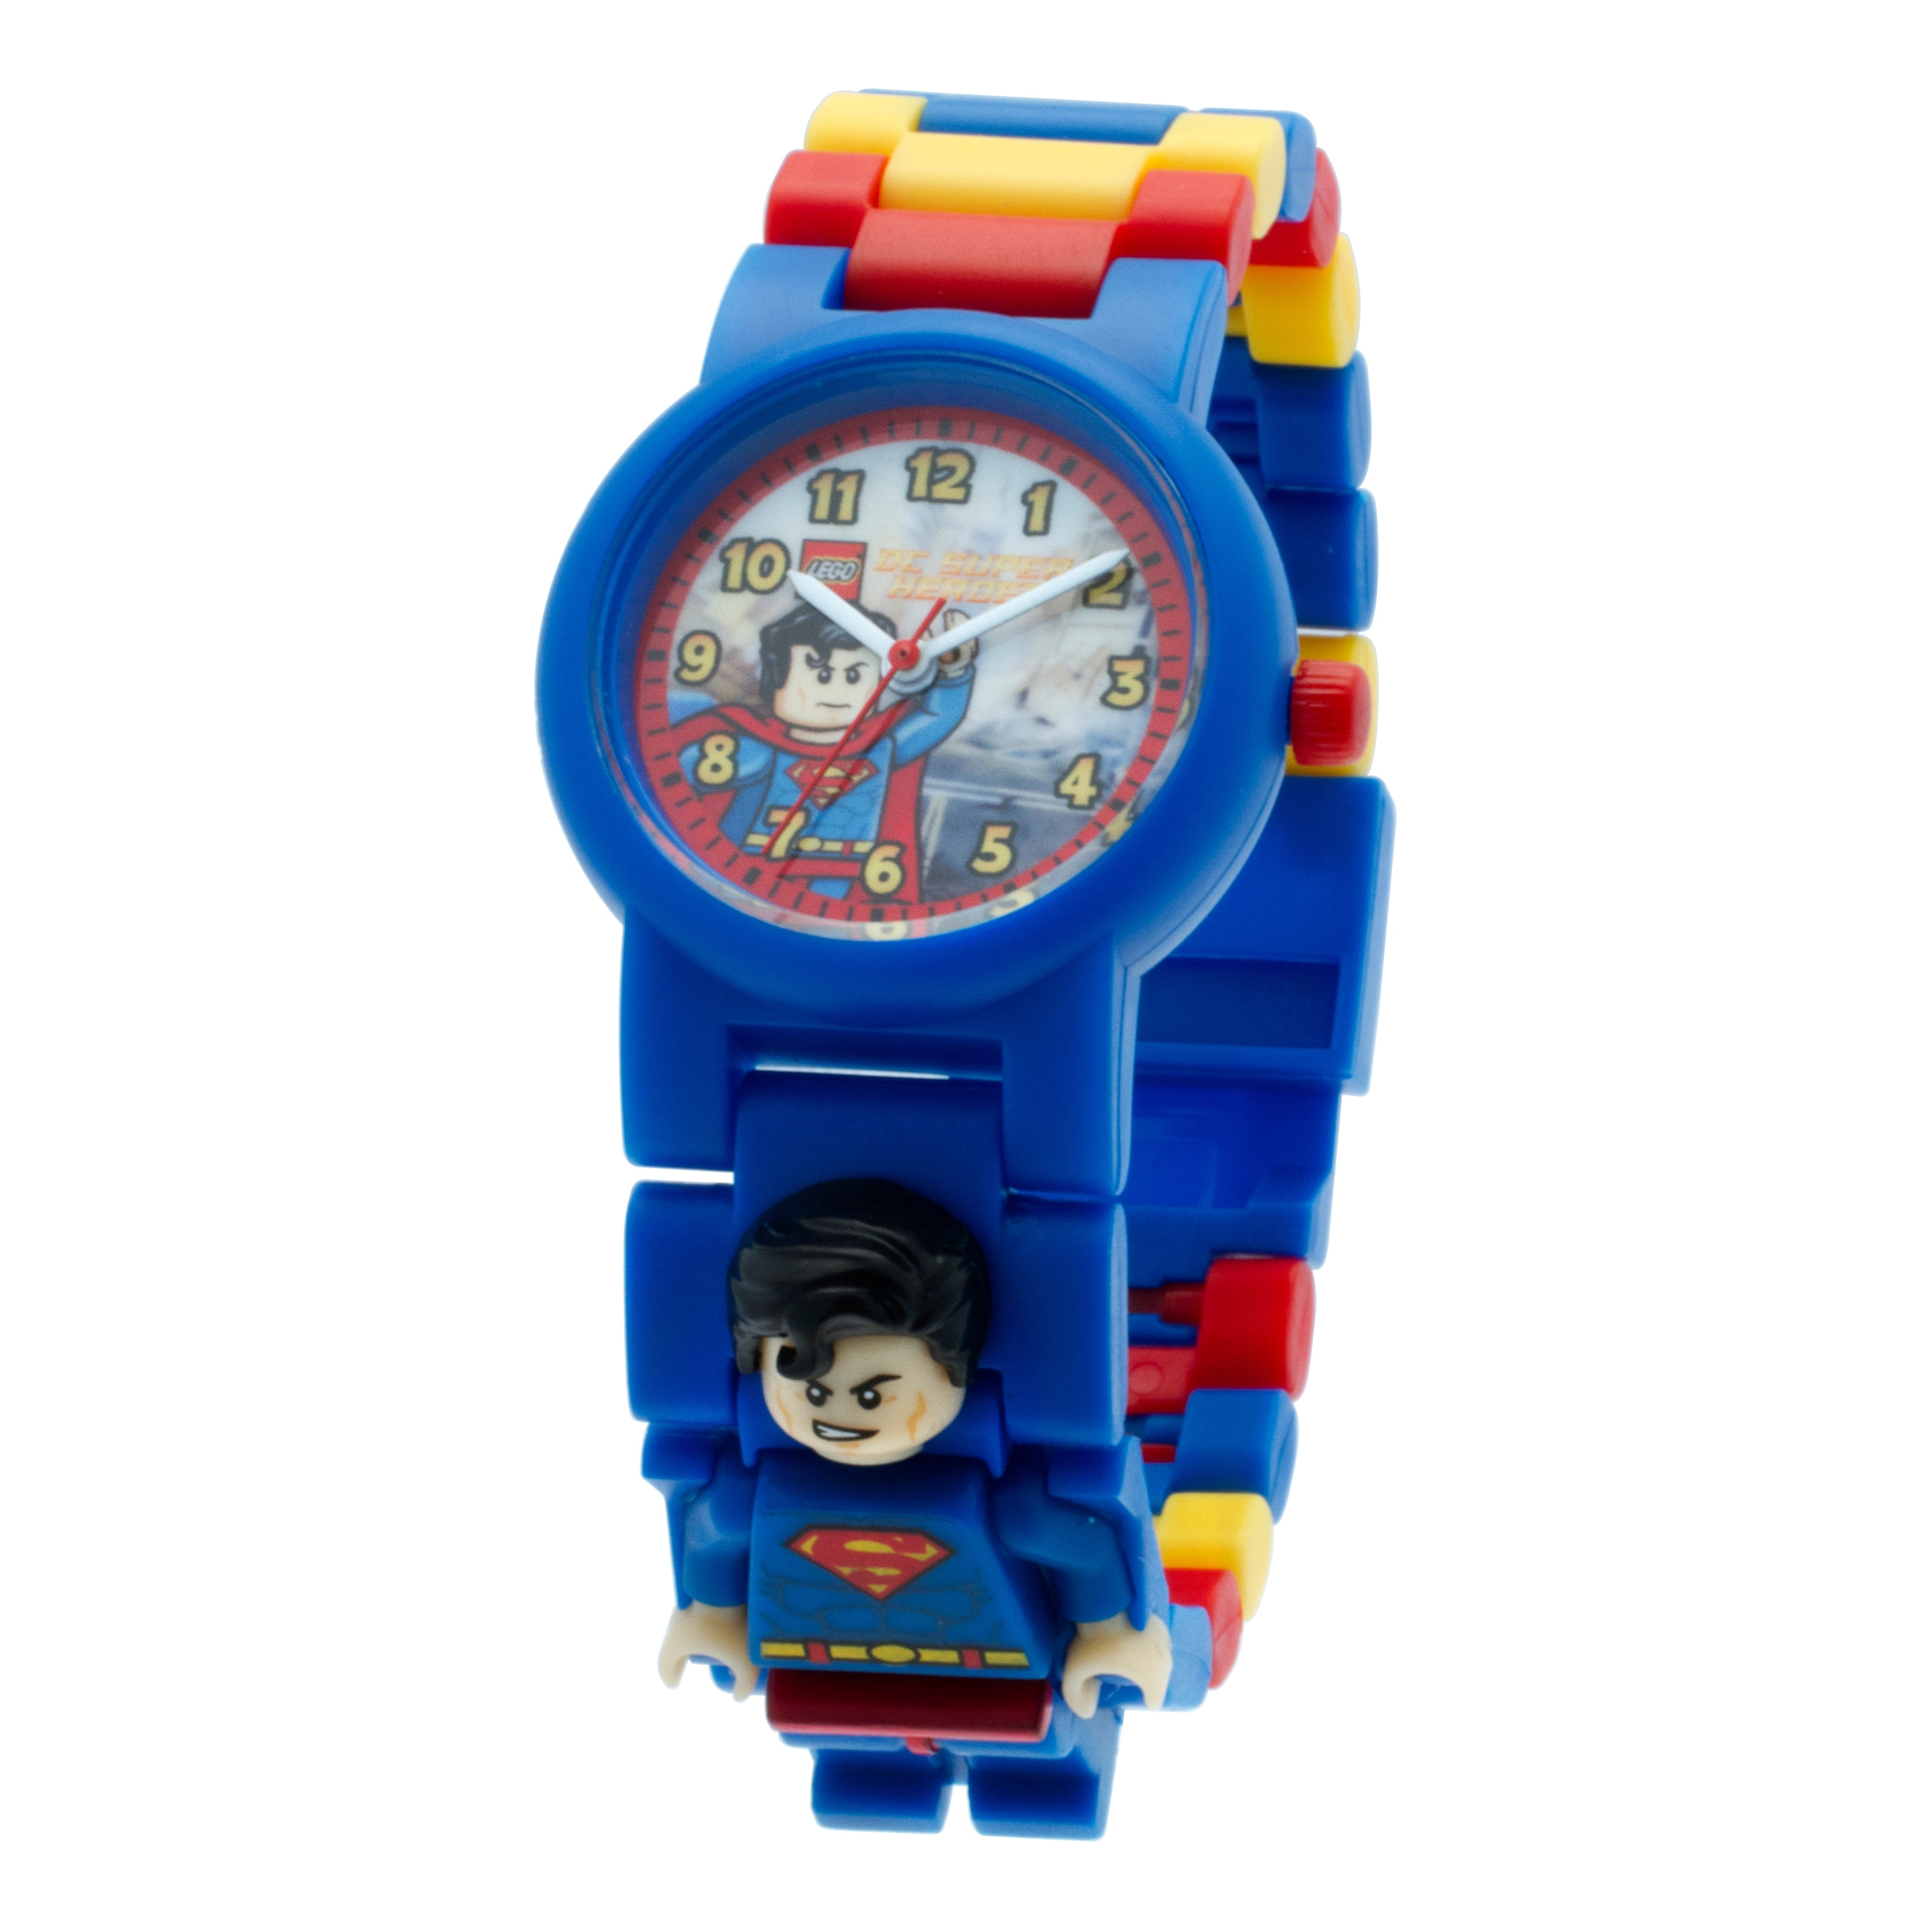 Lego Super Heroes Superman Kid's Minifigure Interchangeab...